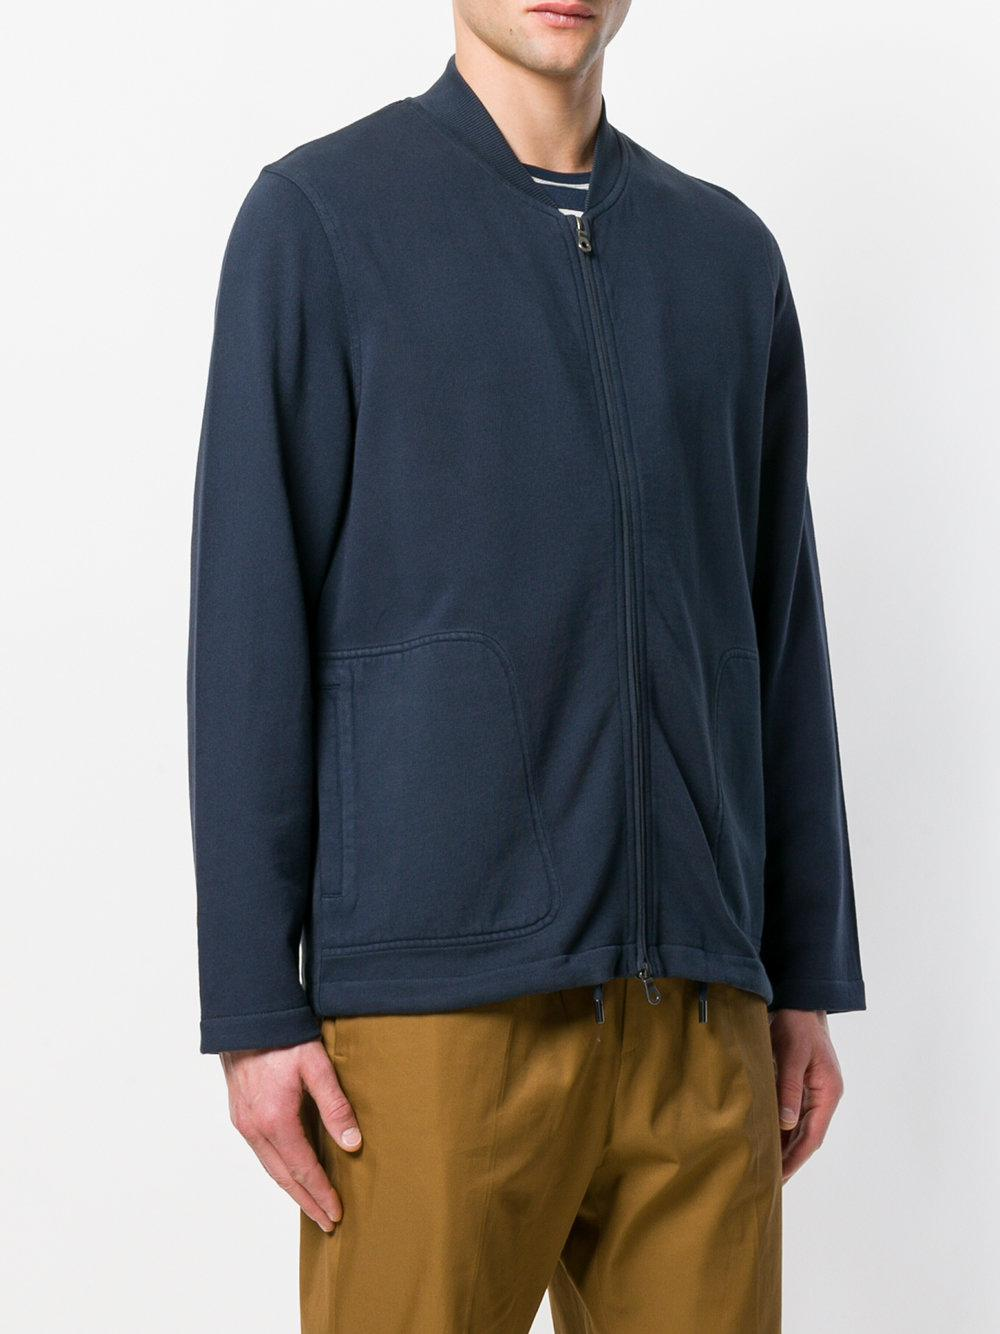 Folk Cotton Combination Bomber Jacket in Blue for Men